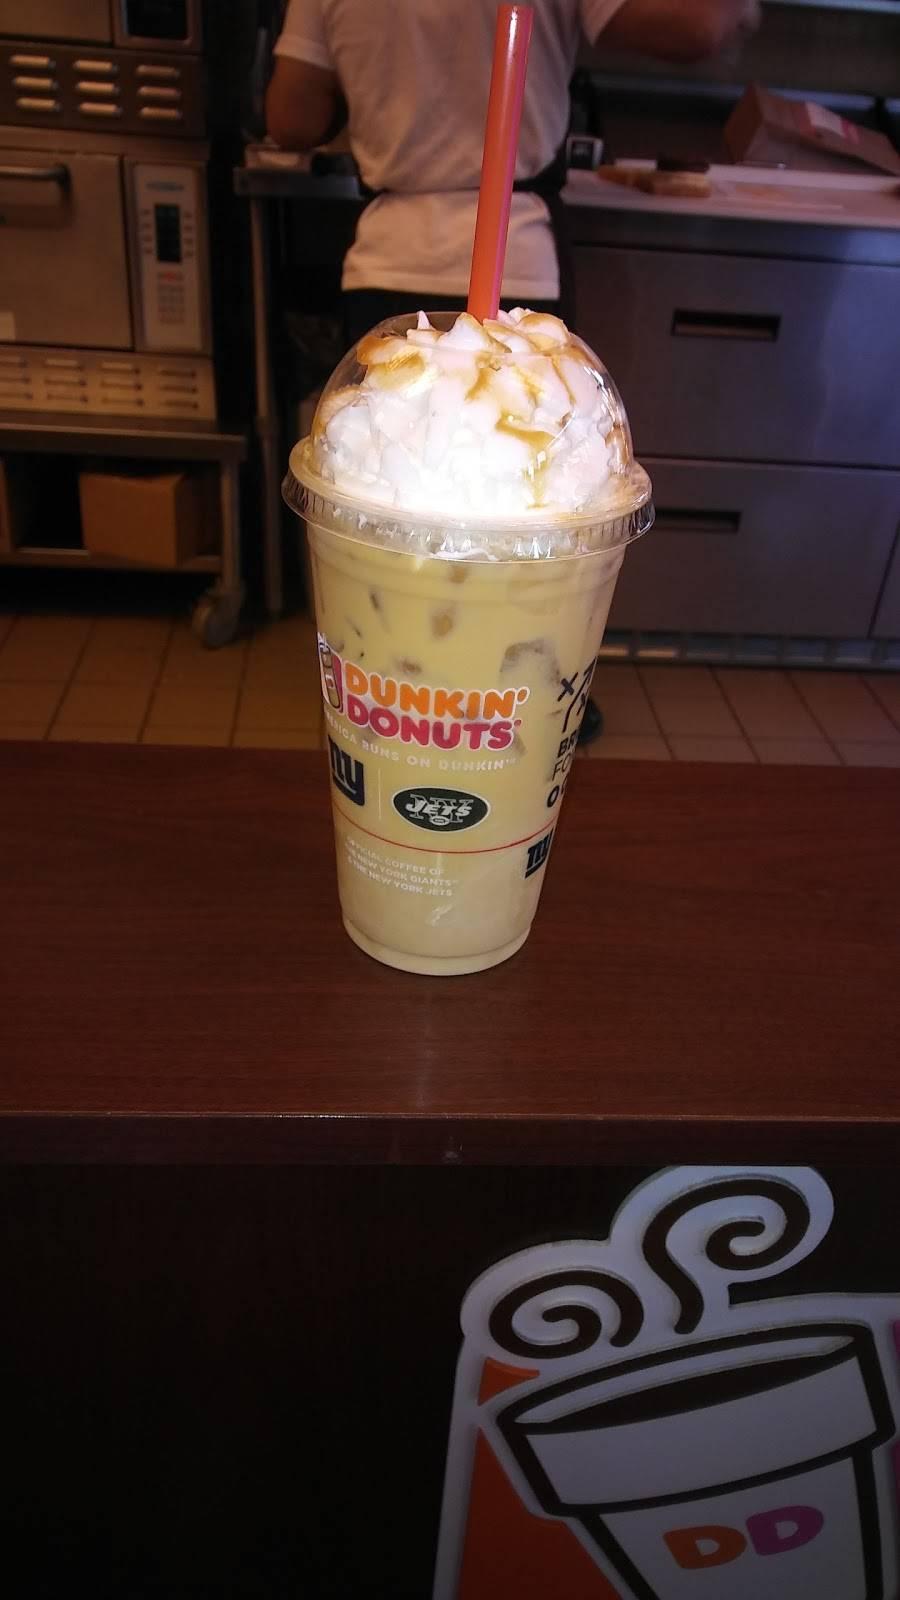 Dunkin Donuts   cafe   712 E 233rd St, Bronx, NY 10466, USA   7187980380 OR +1 718-798-0380